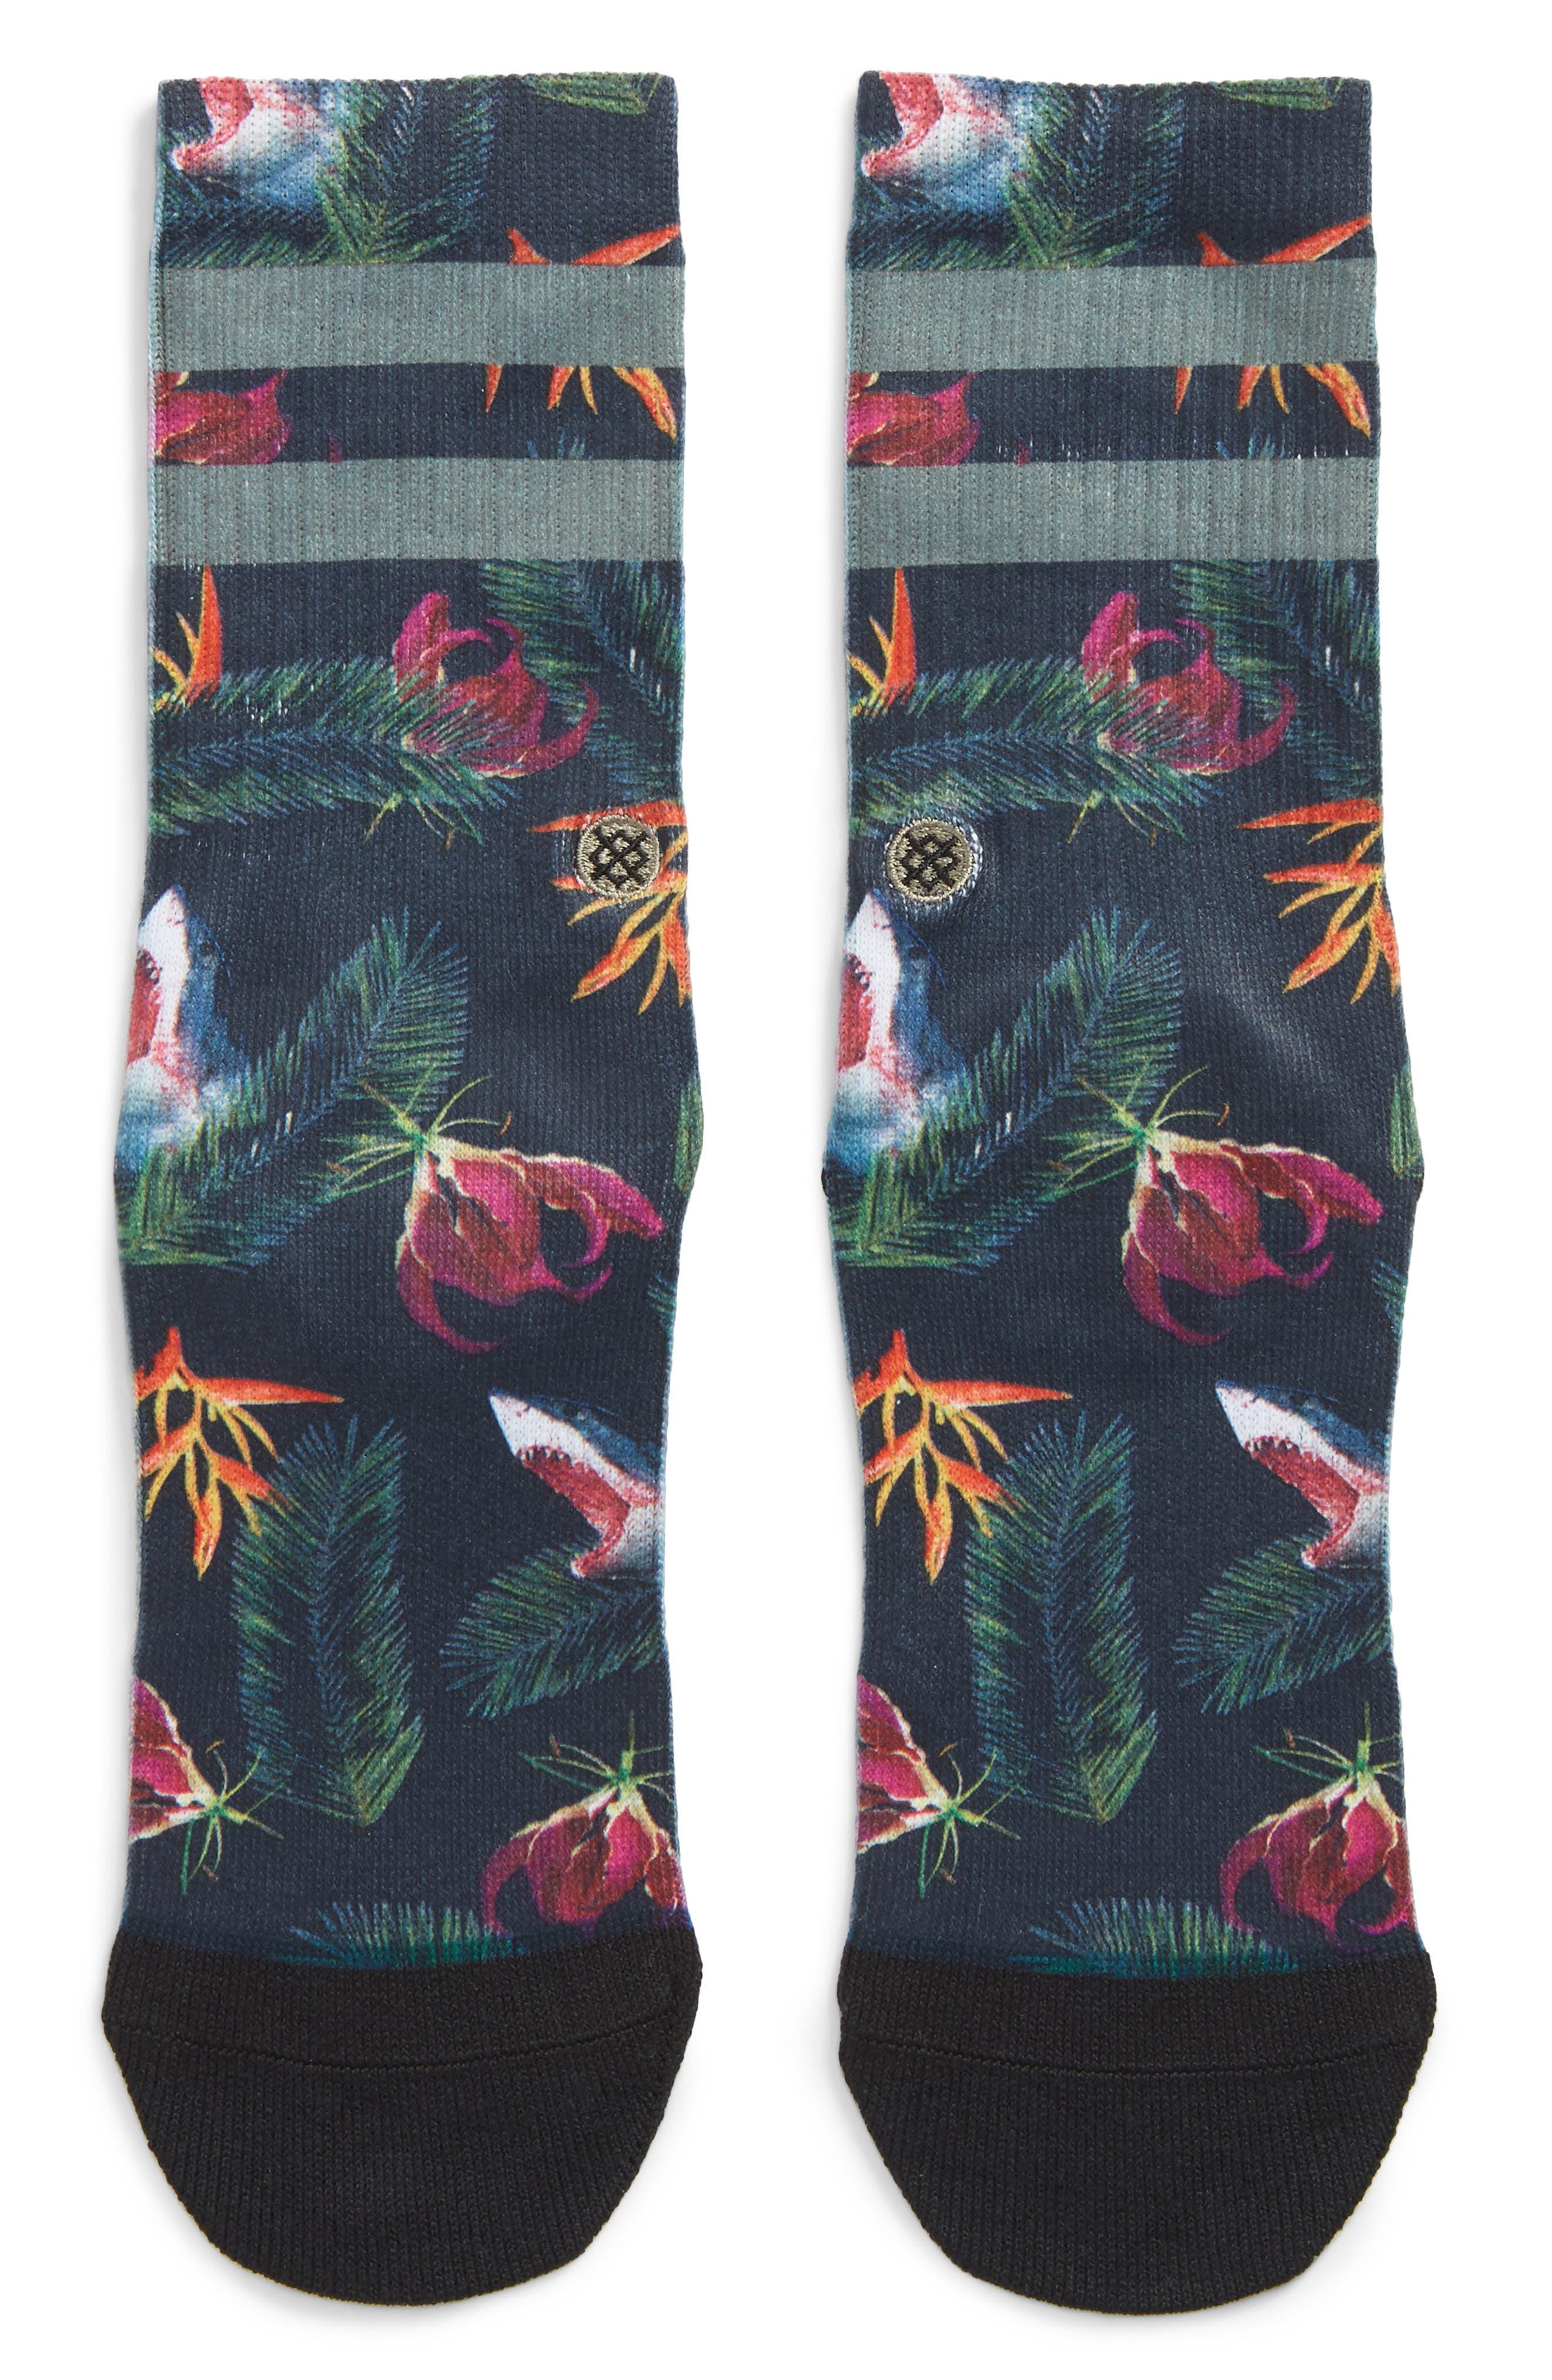 Alternate Image 1 Selected - Stance Fish Food Crew Socks (Big Kid)